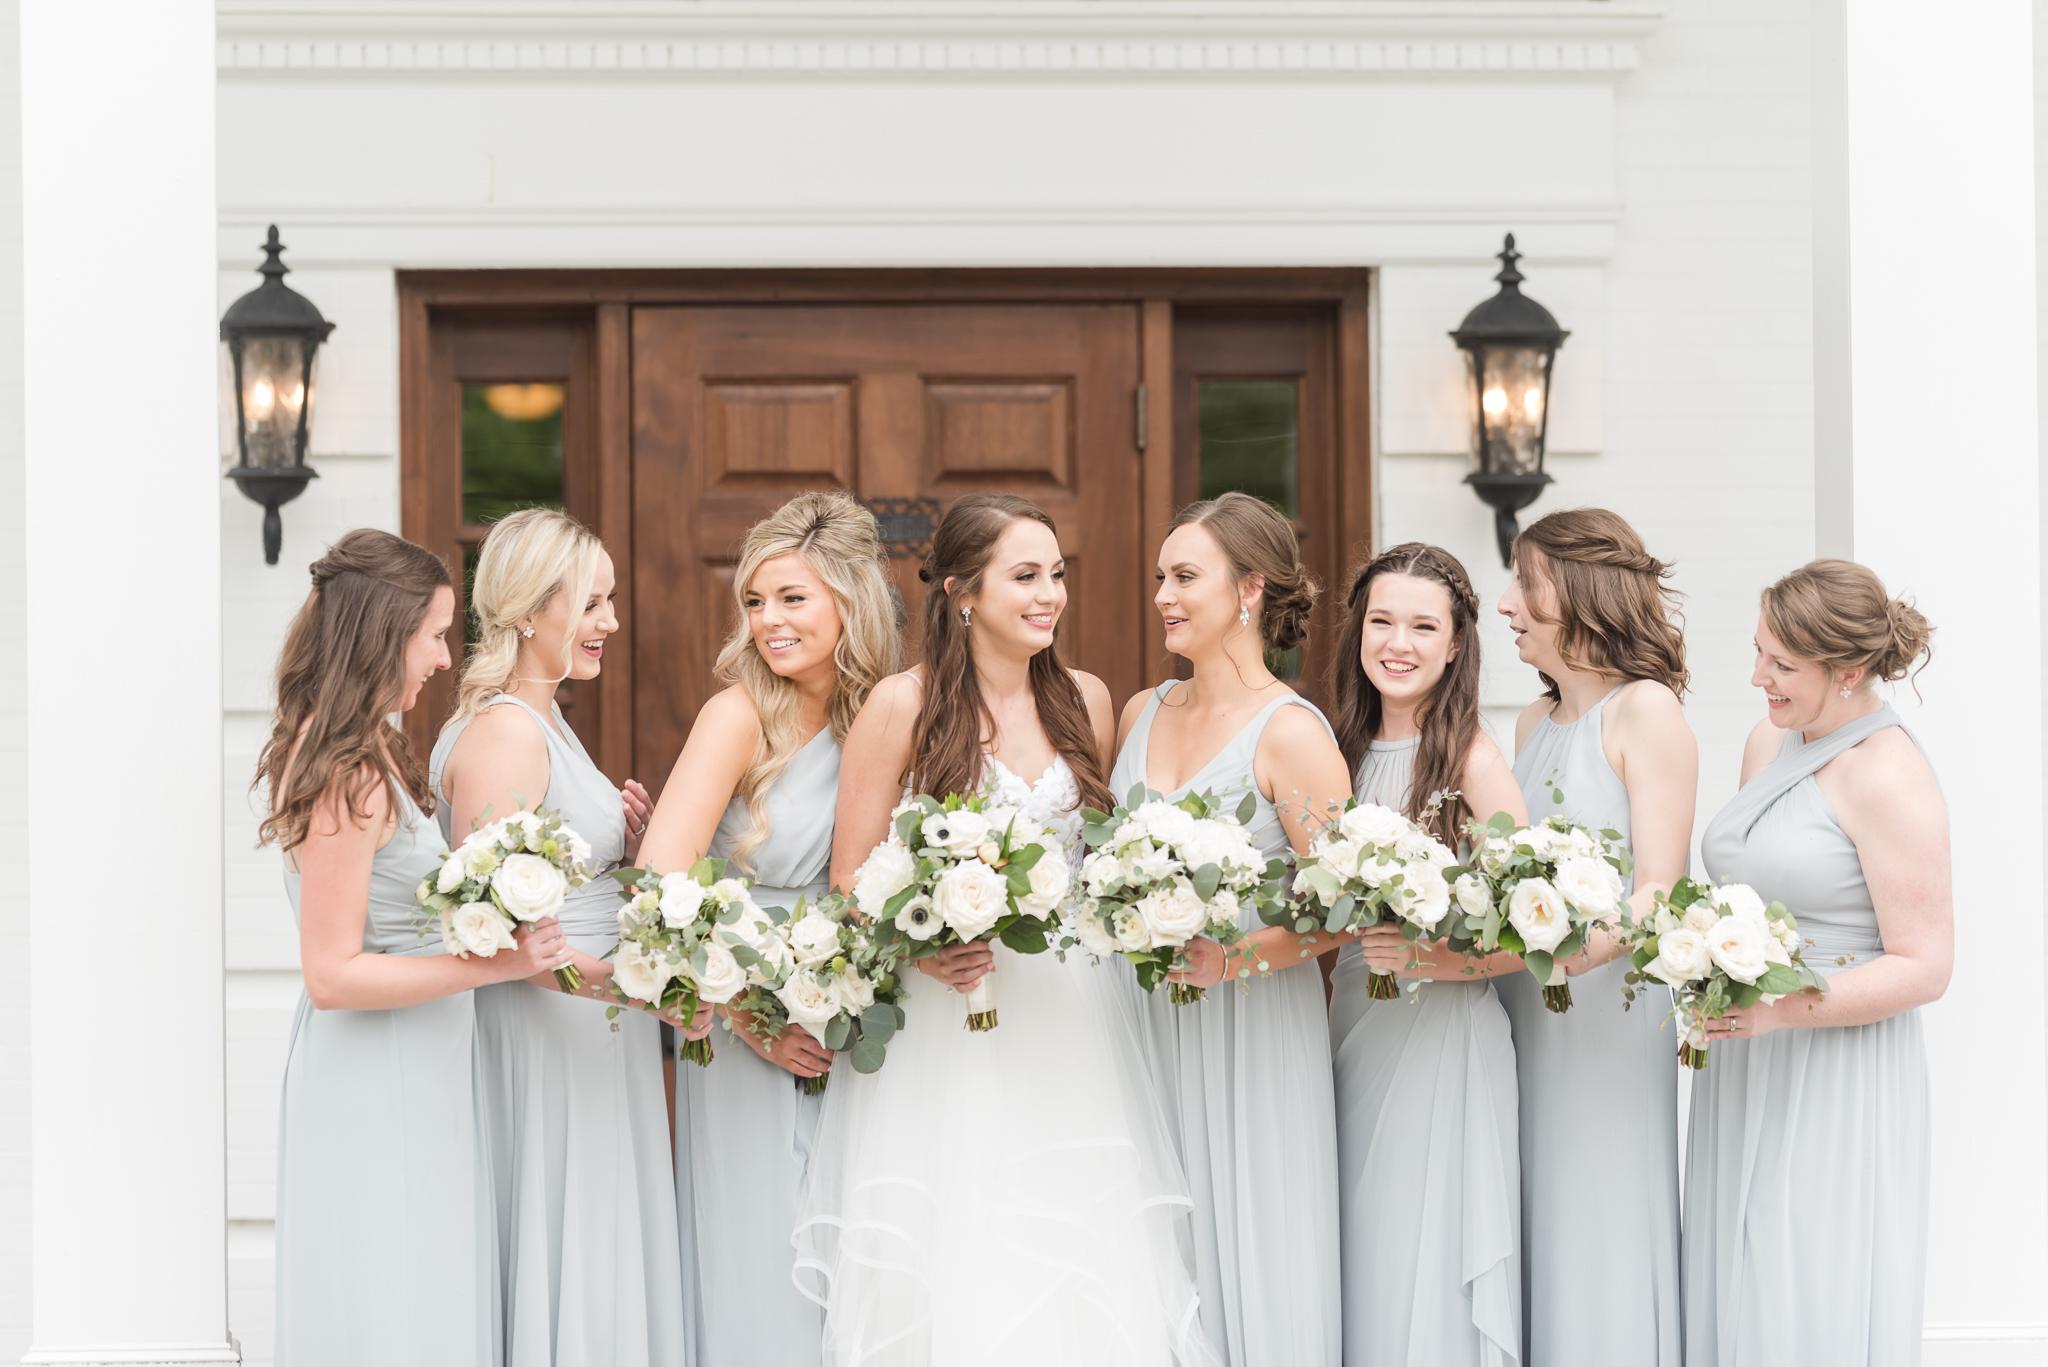 Black Iris Estate Wedding Elegant White with Greenery Luxury High End Flowers-4.jpg